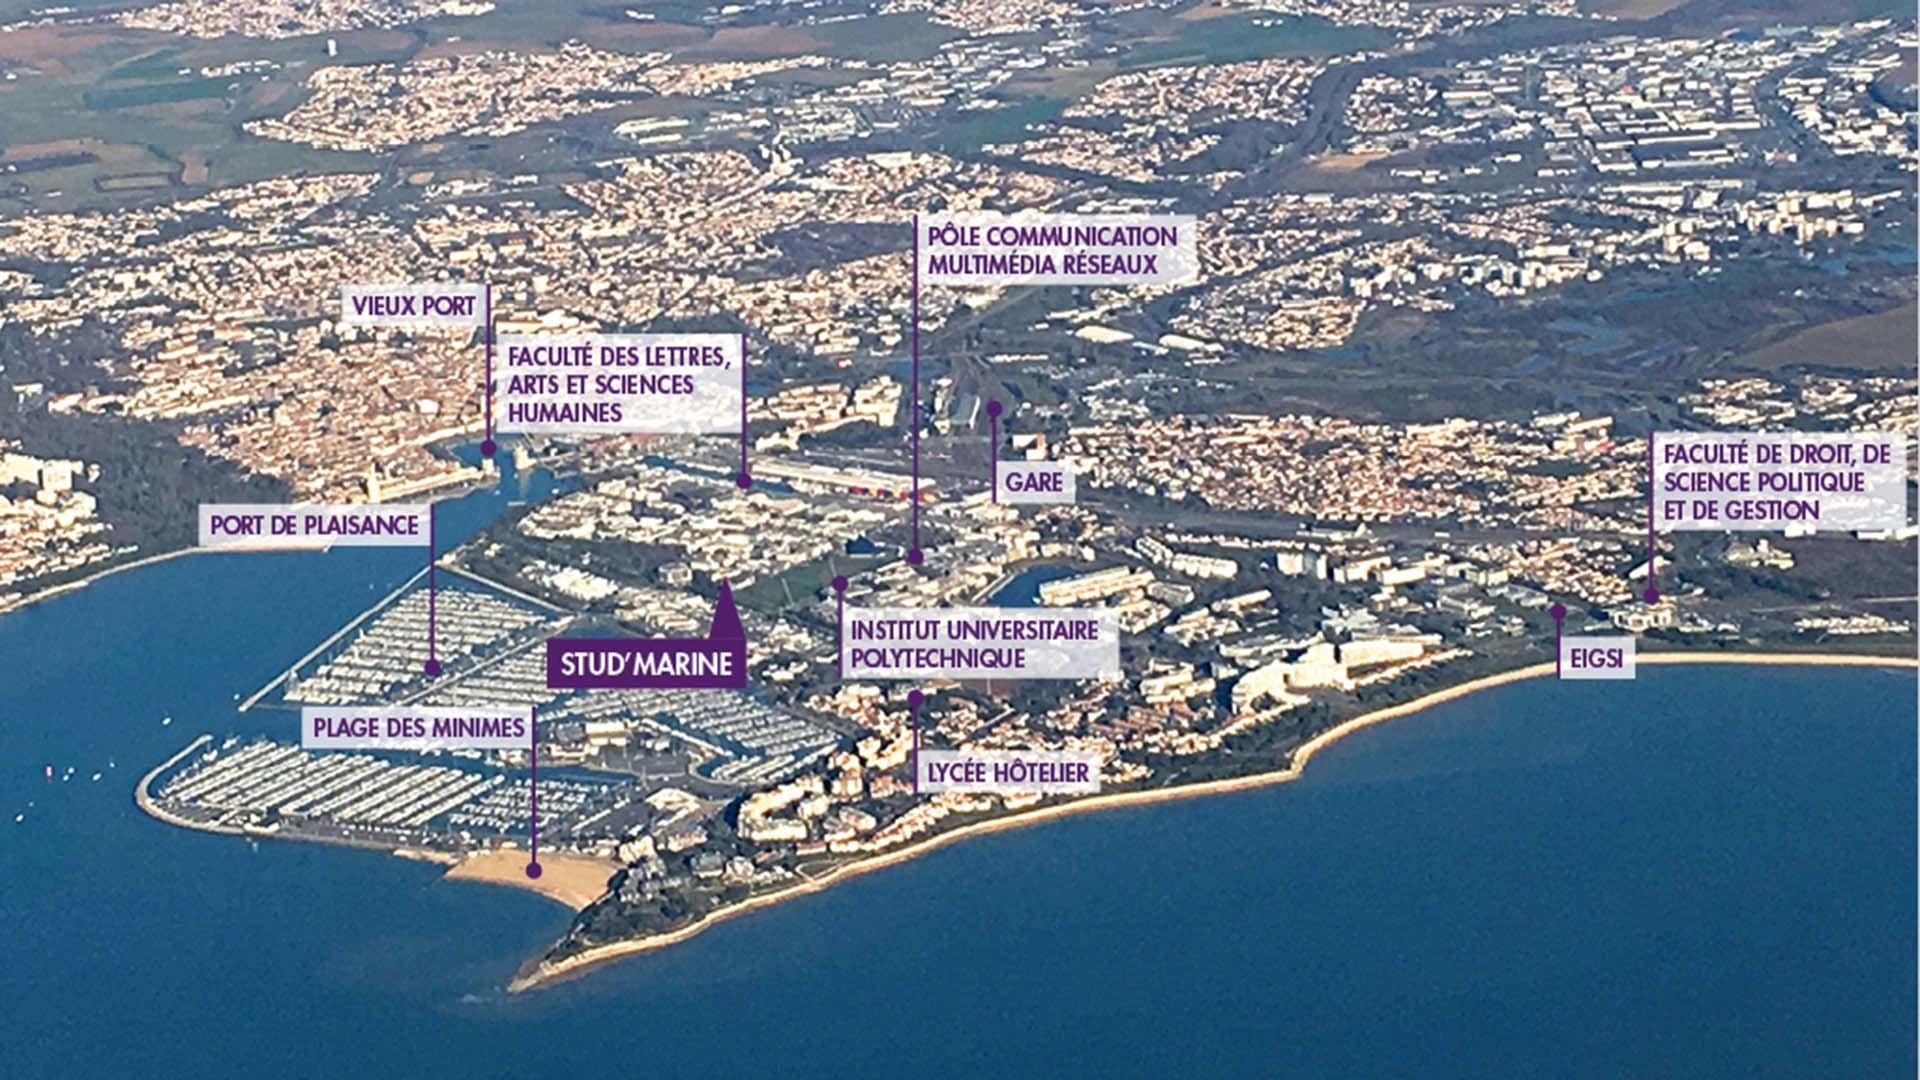 Programme Immeuble - La Rochelle